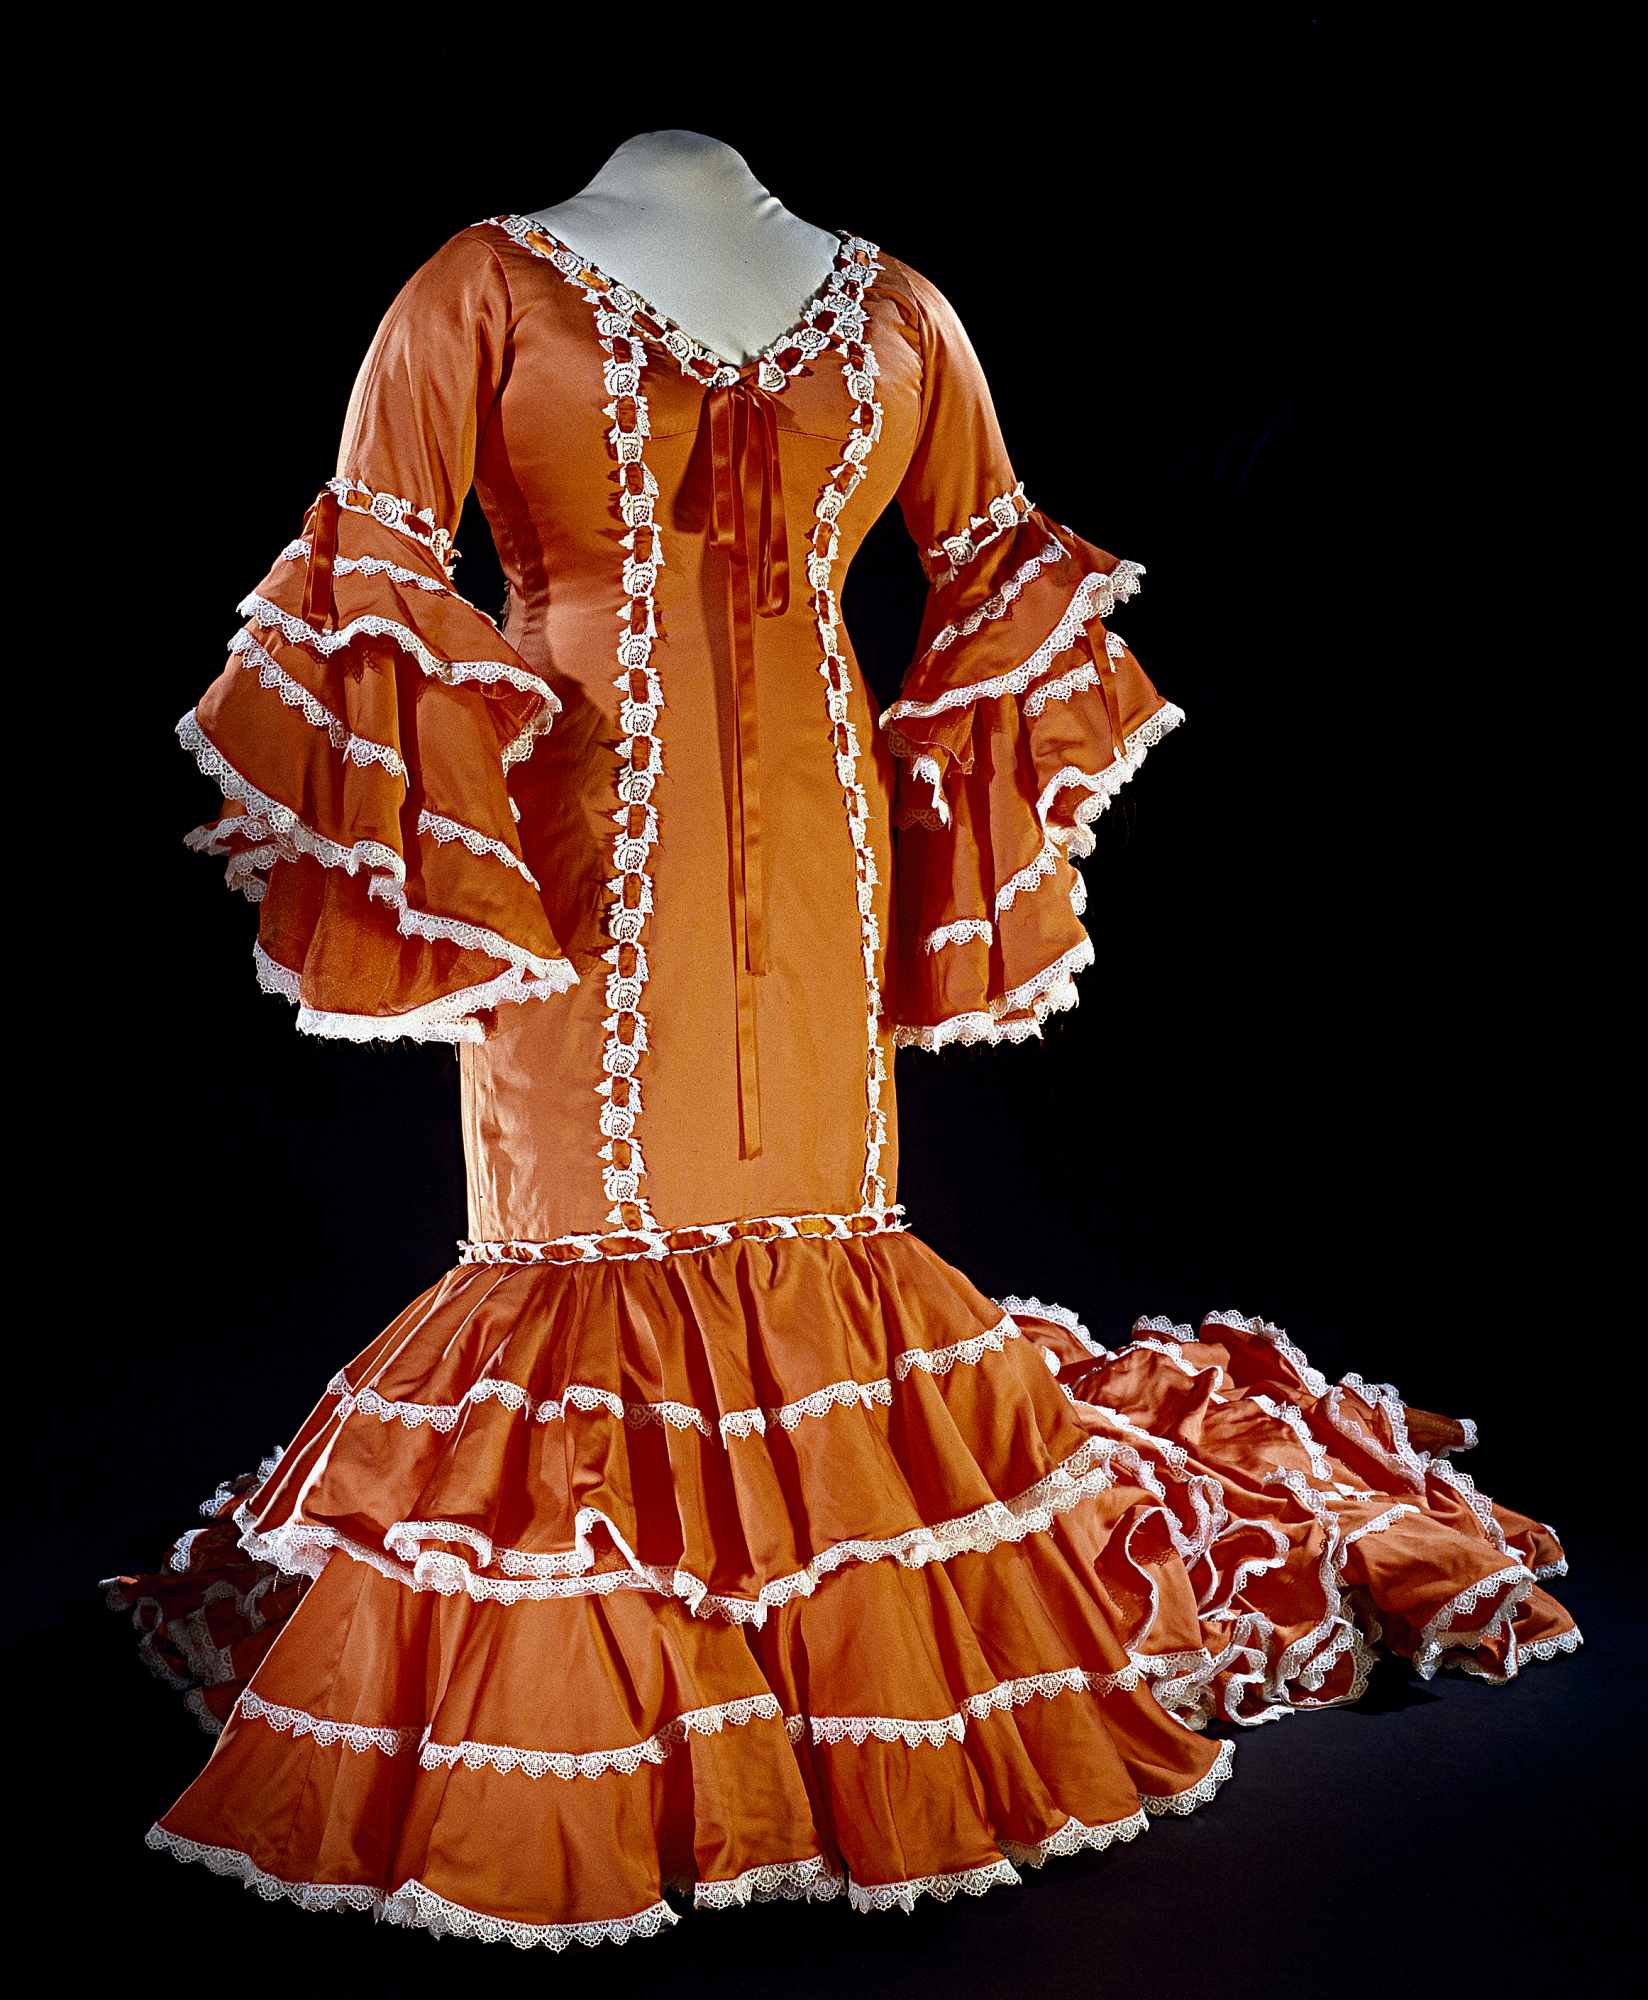 images for Cuban Rumba Dress